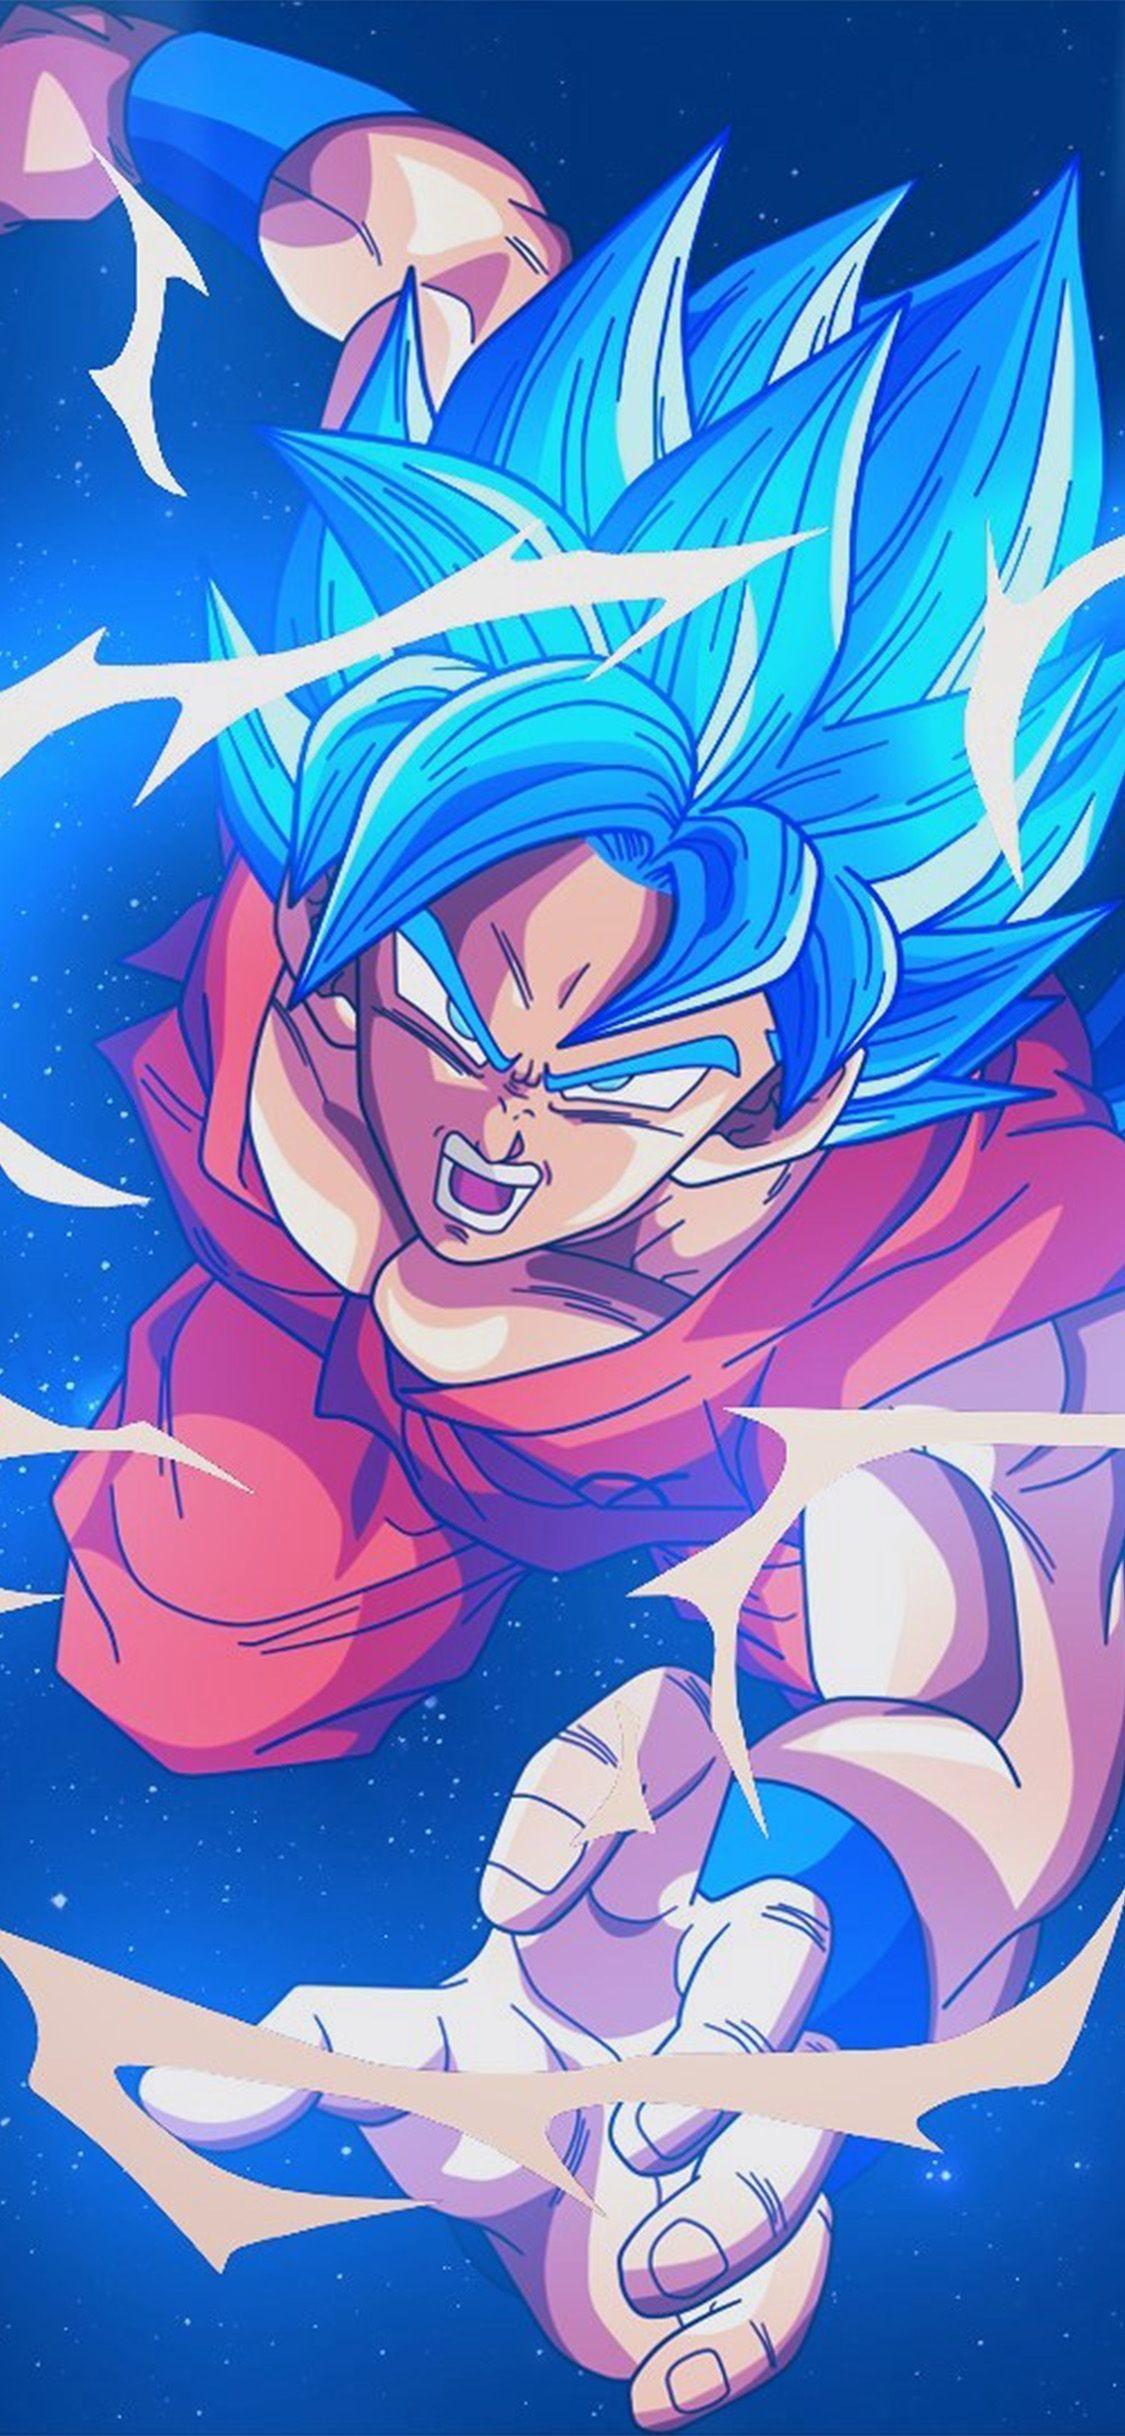 Bc54 Dragonball Goku Blue Art Illustration Anime Via - Dragon Ball Z Wallpaper Iphone X - HD Wallpaper